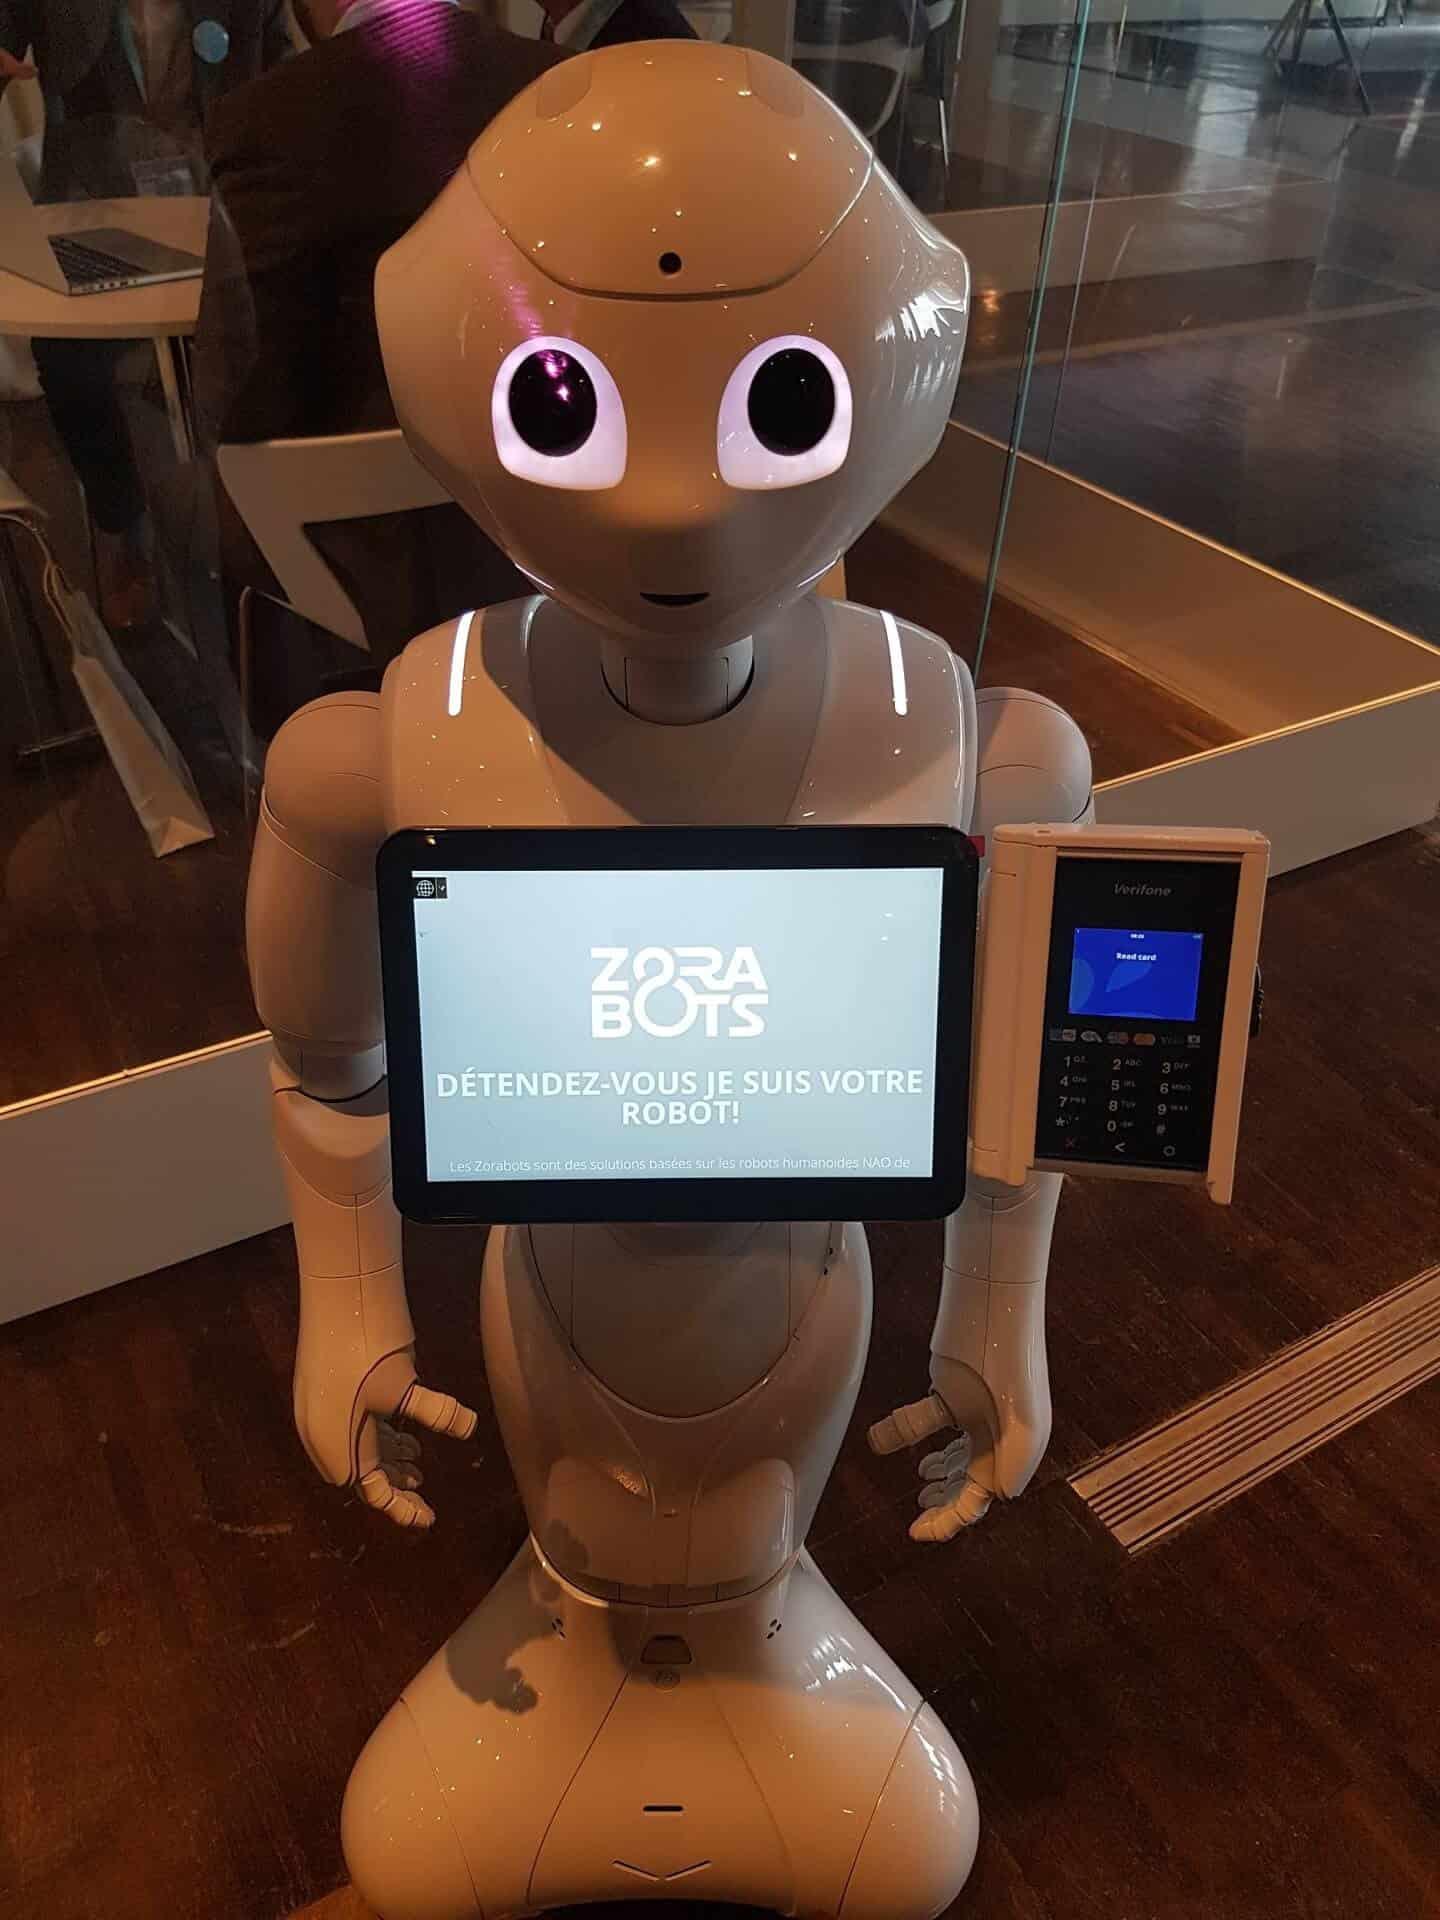 Bristol robotics company discover new applications for